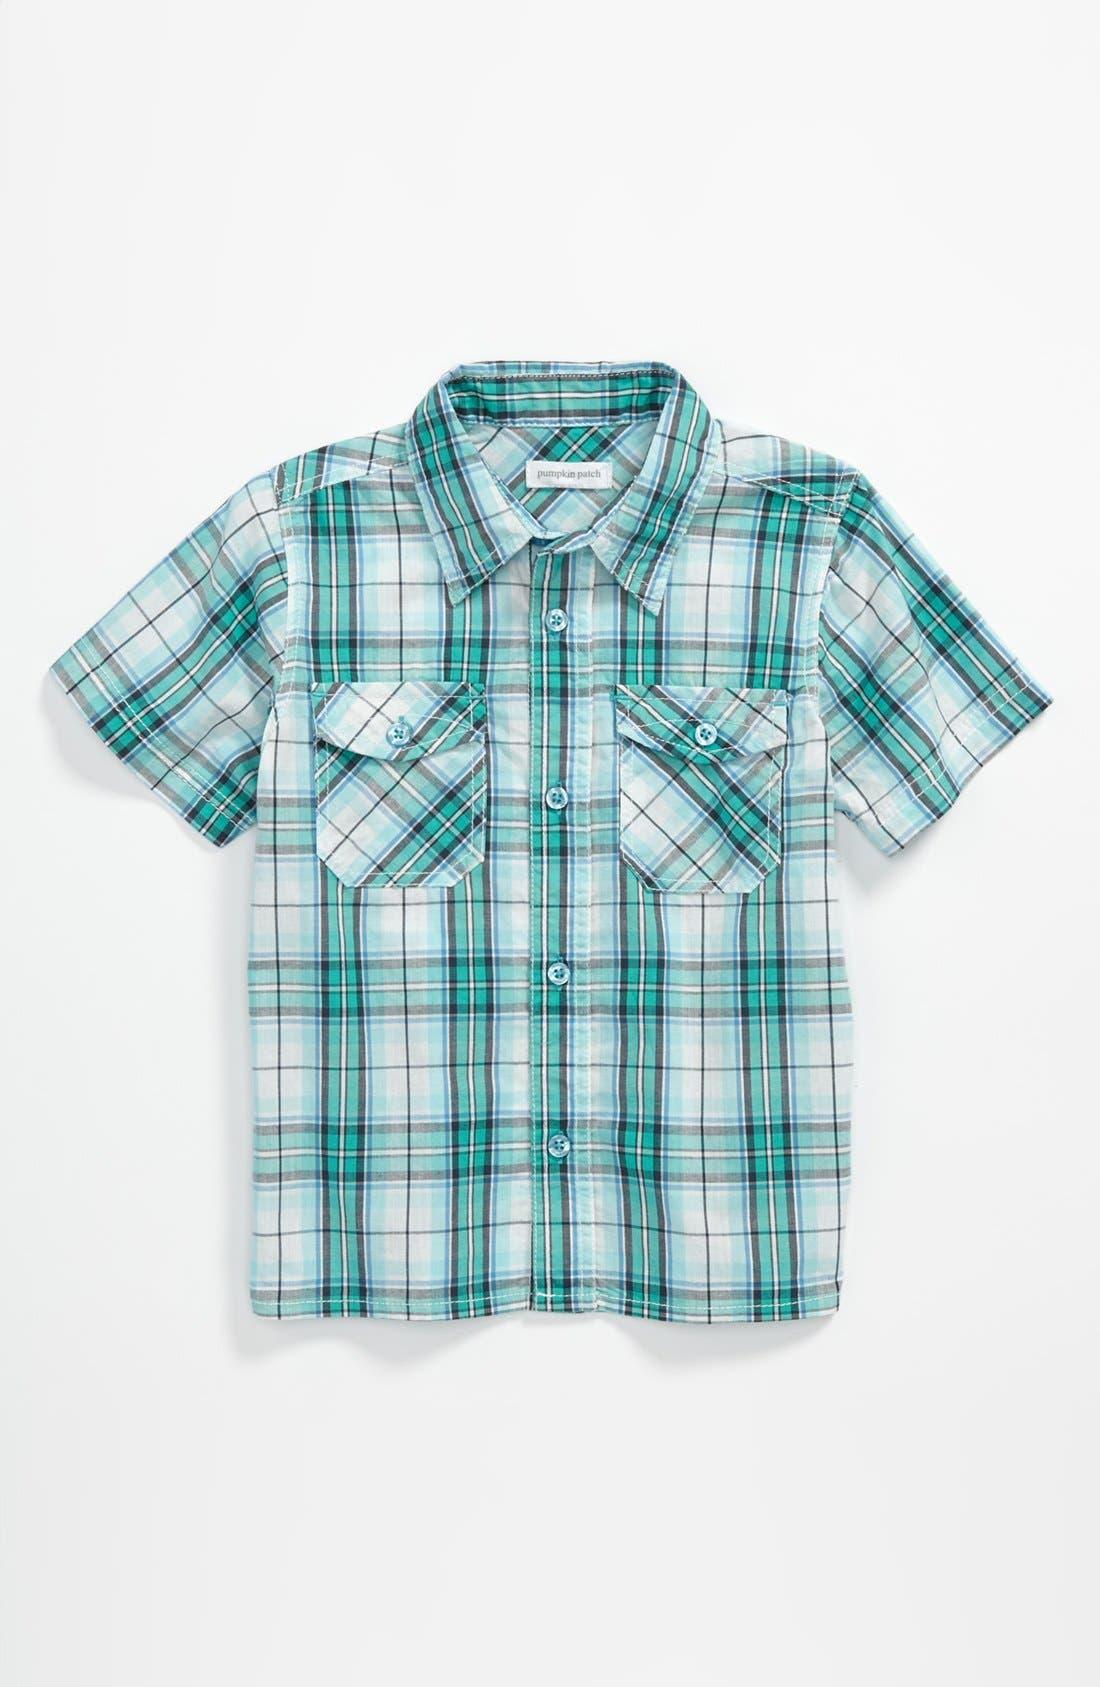 Alternate Image 1 Selected - Pumpkin Patch Check Shirt (Toddler)